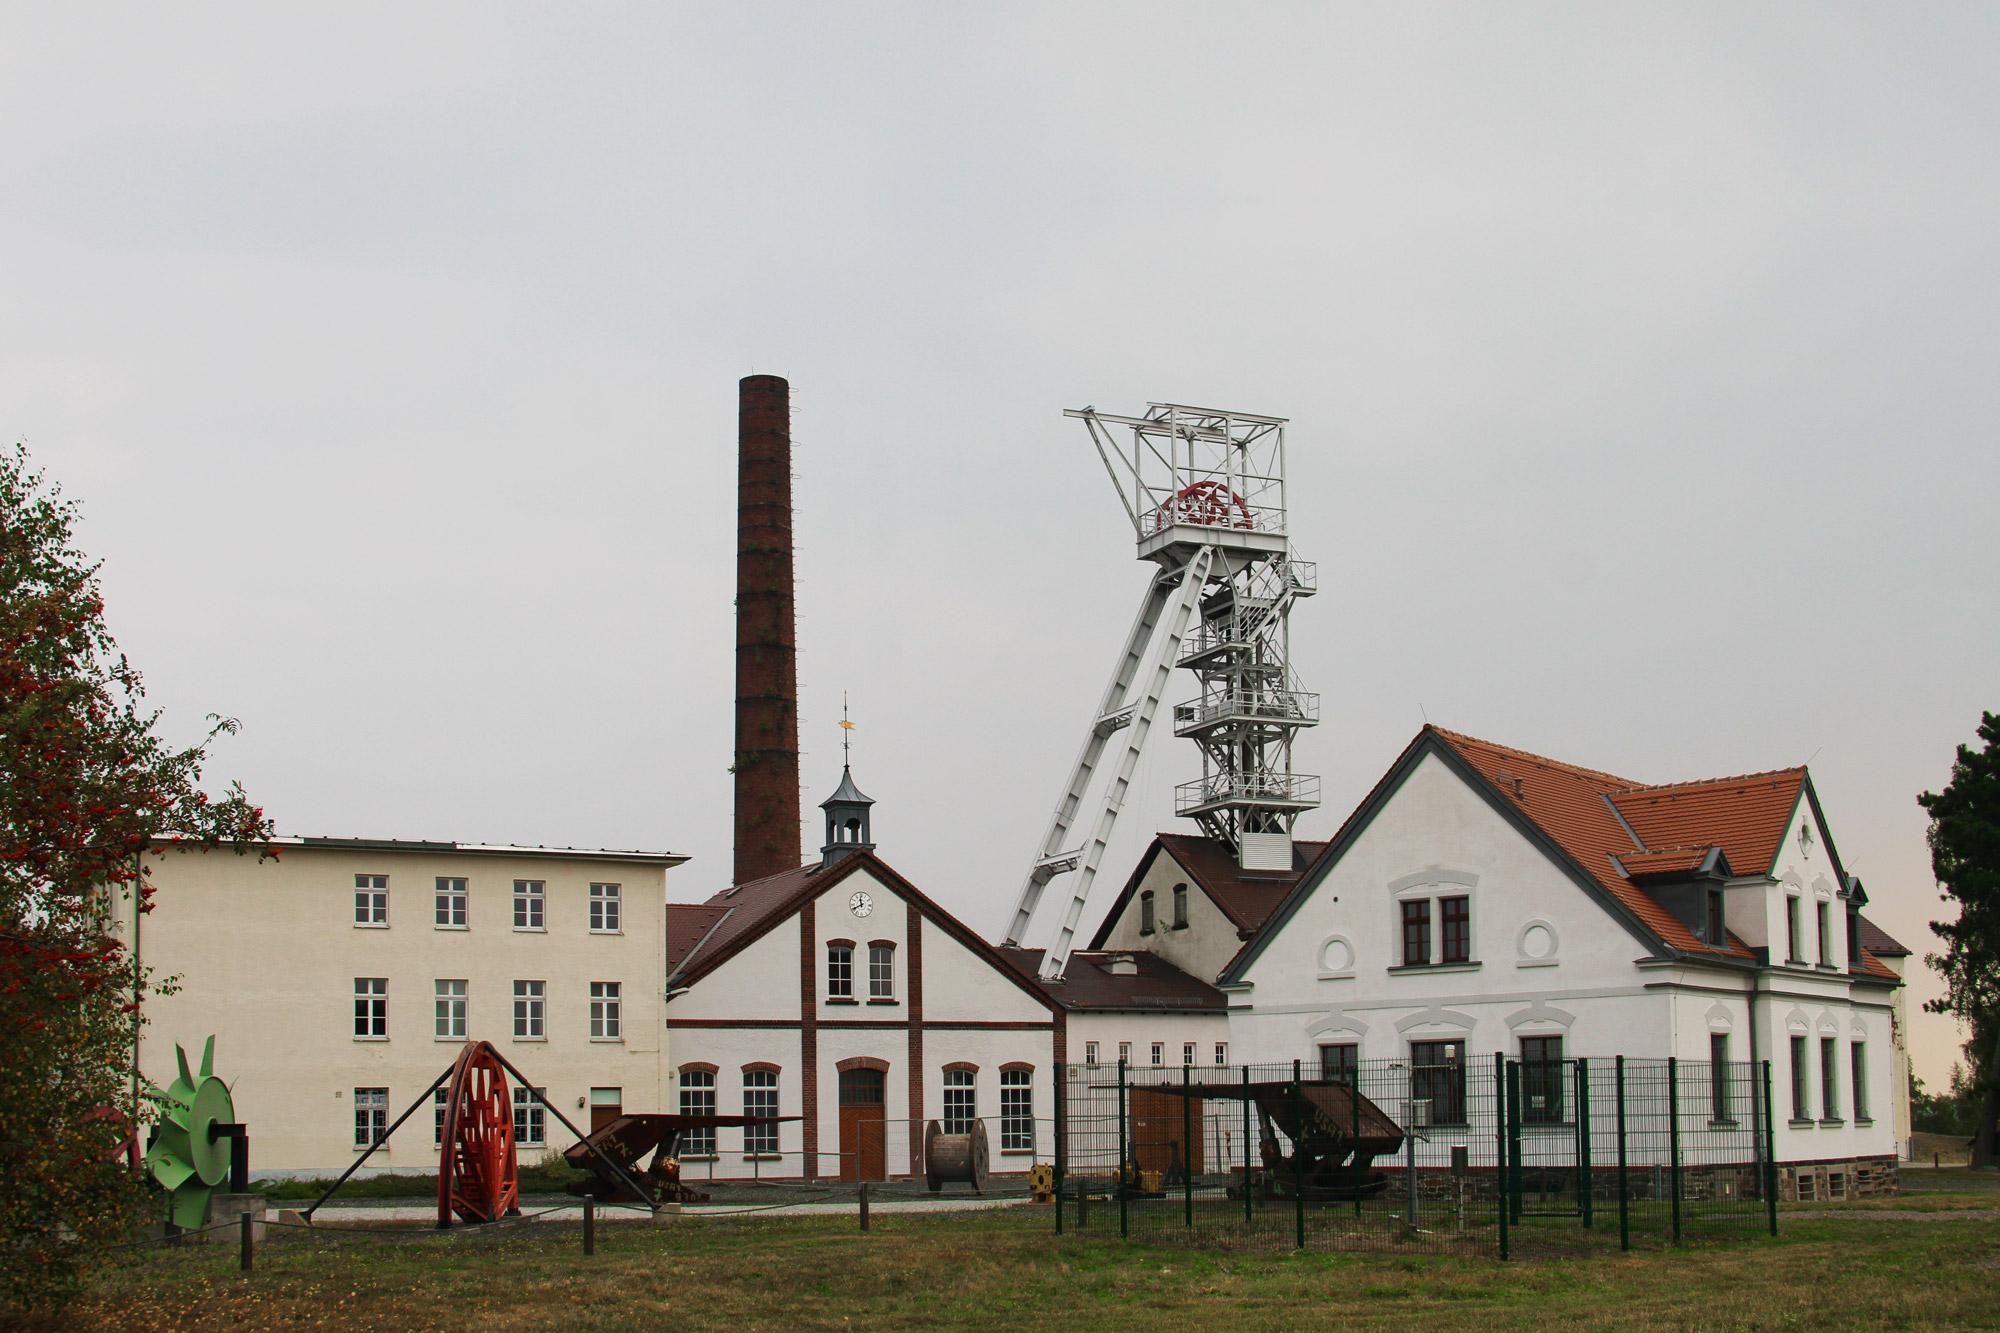 Freiberg, de zilverstad in Saksen - Reiche Zeche